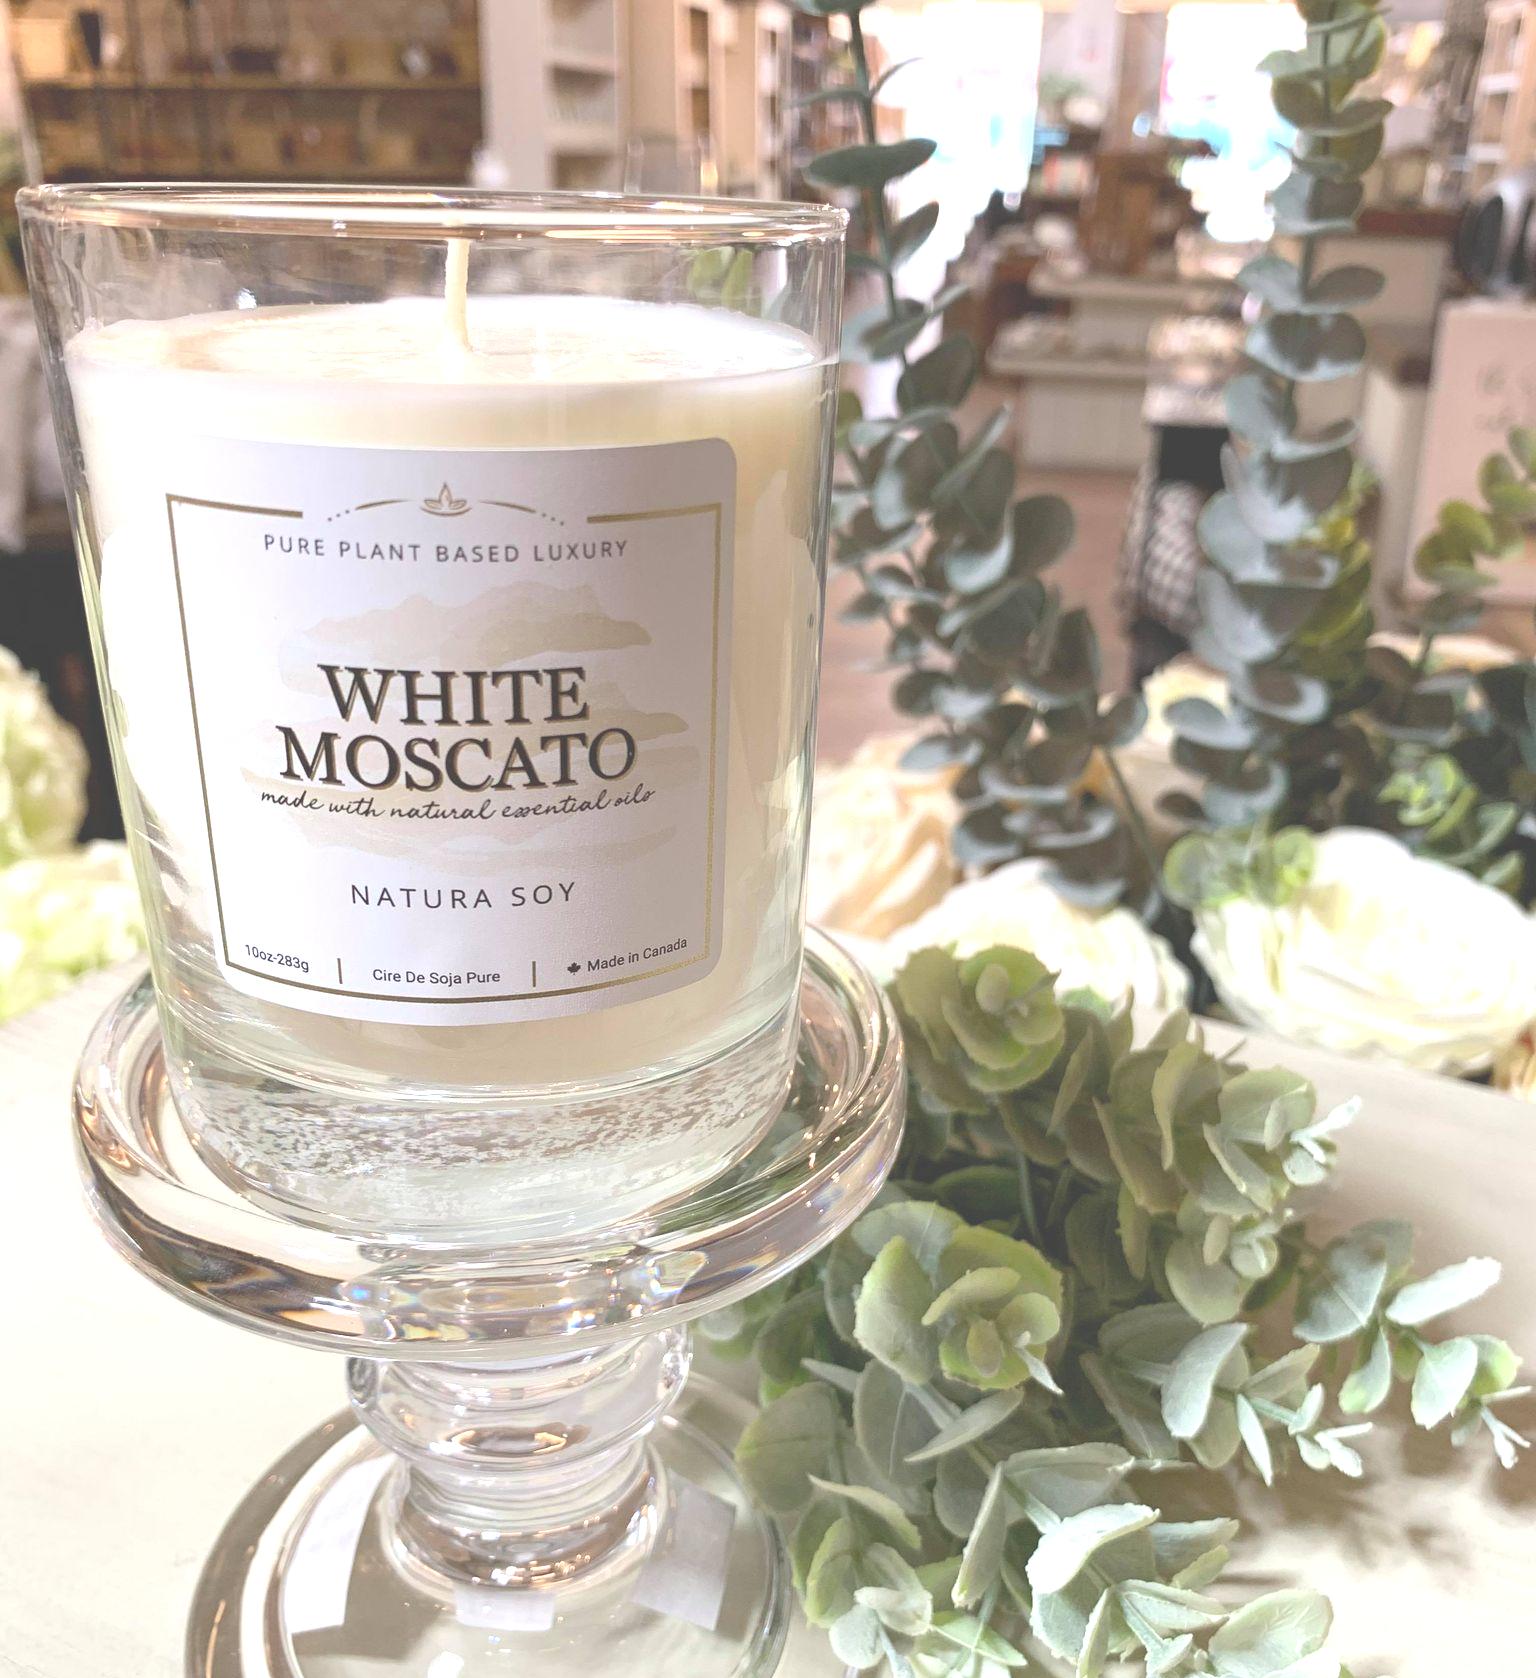 White Moscato Jasmine, Lemon, and Sweet Cognac.